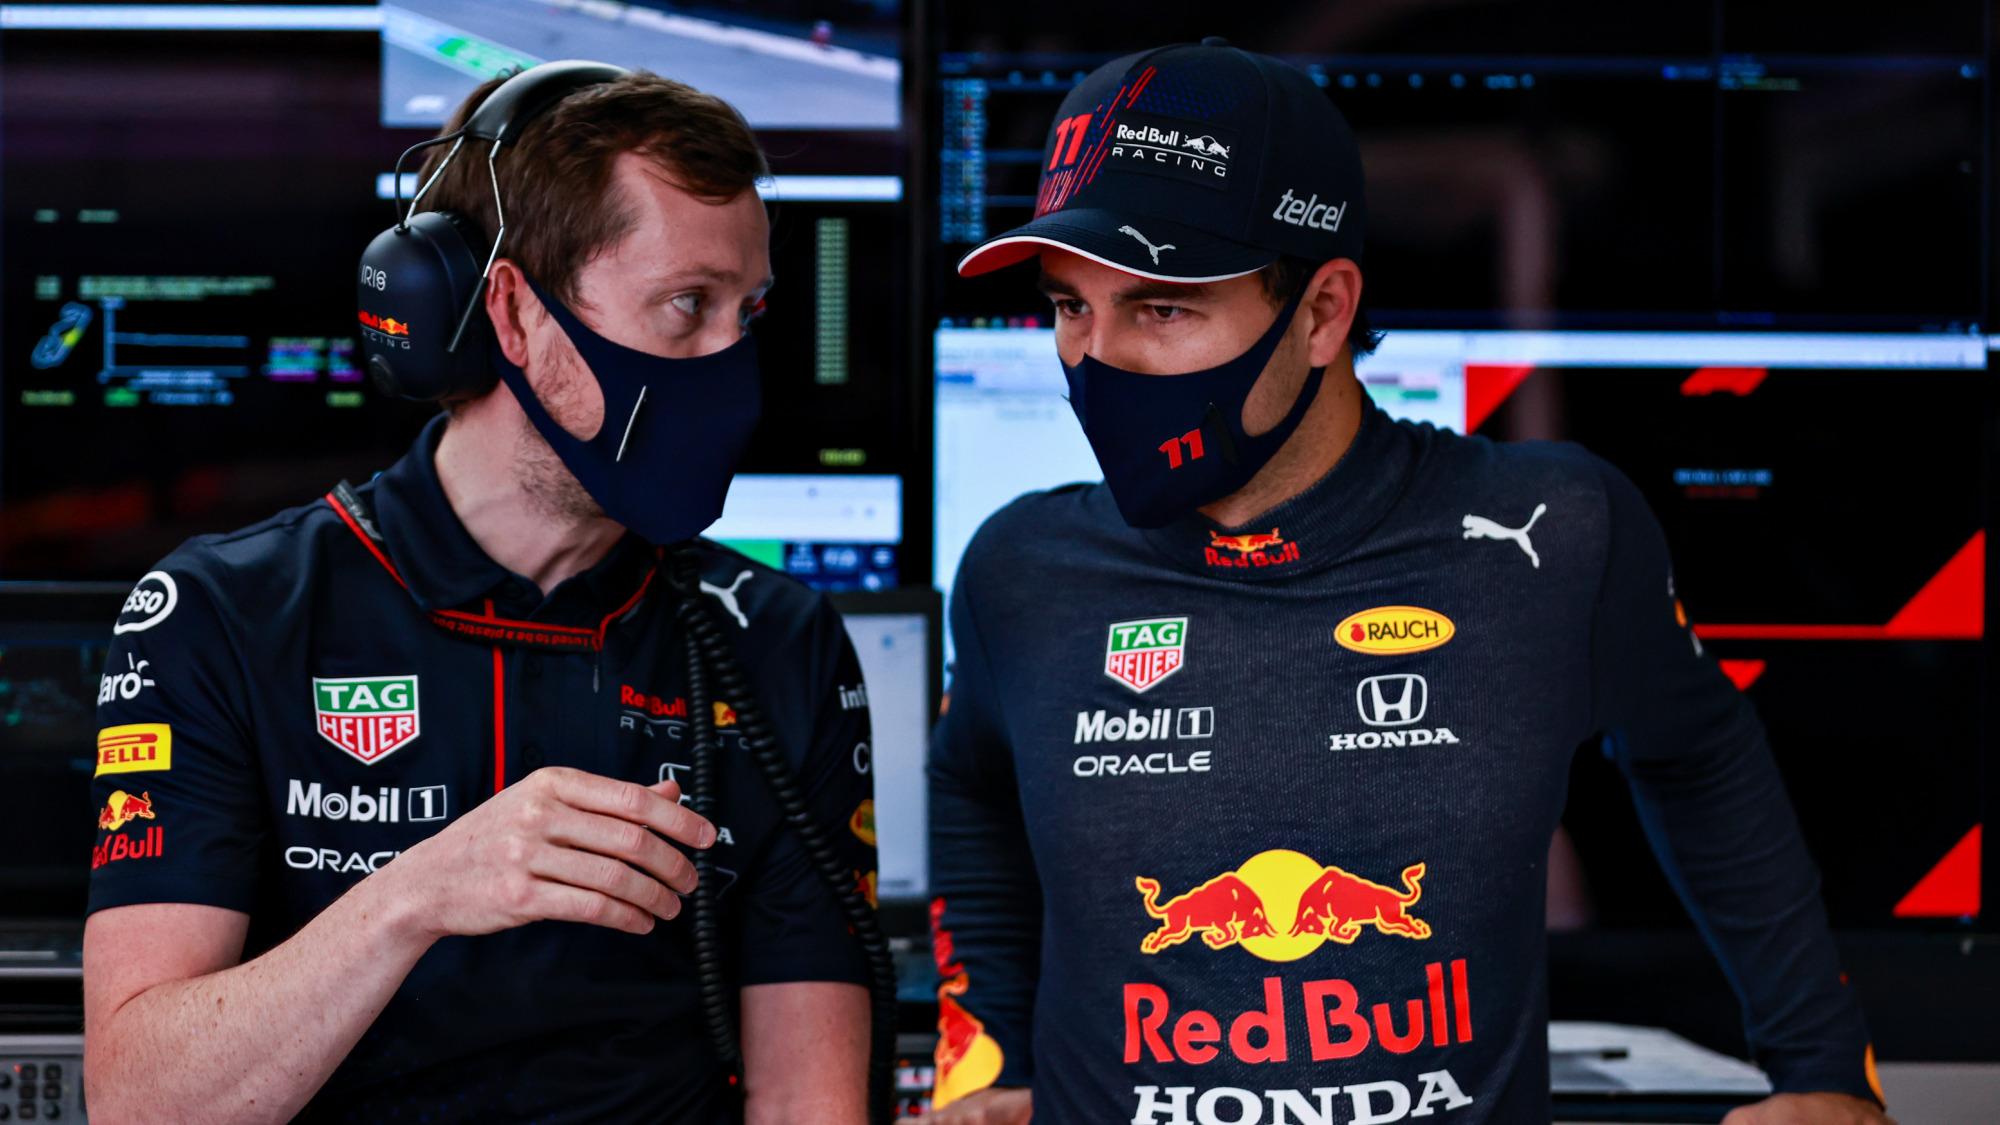 Sergio Perez, 2021 Spanish GP